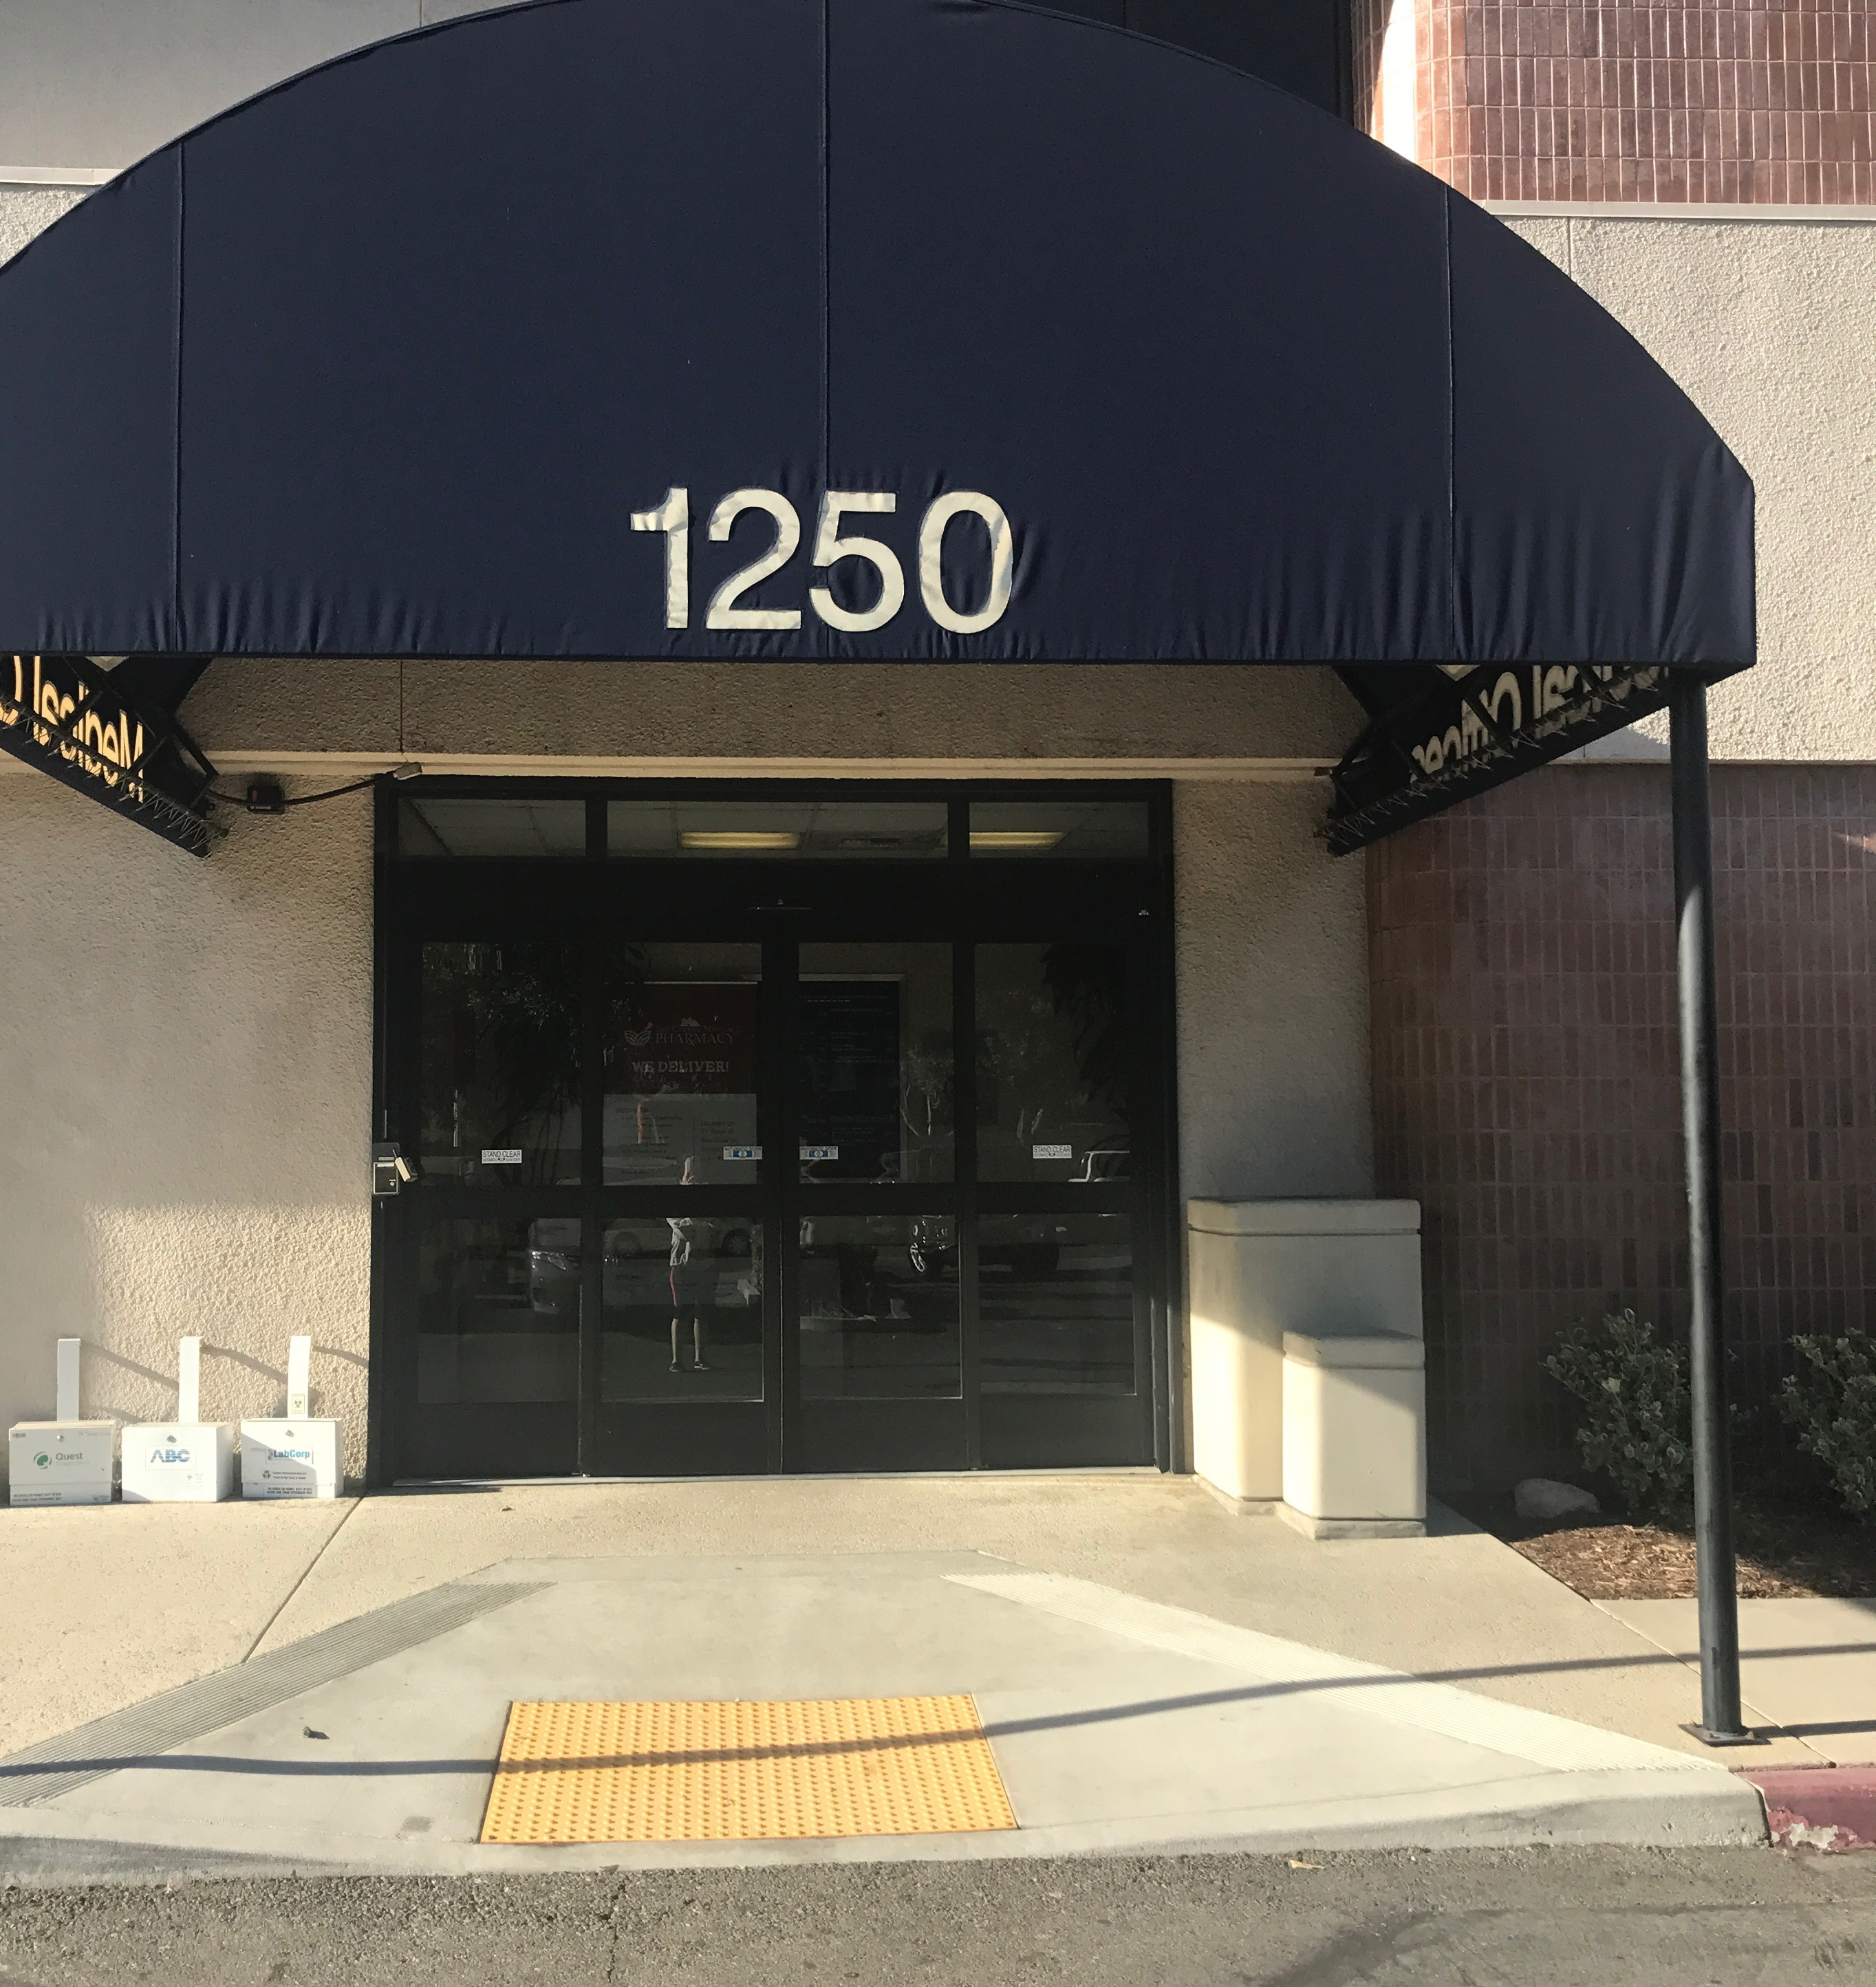 West Covina sleep center 1250 - Advanced Sleep Medicine Services - Front